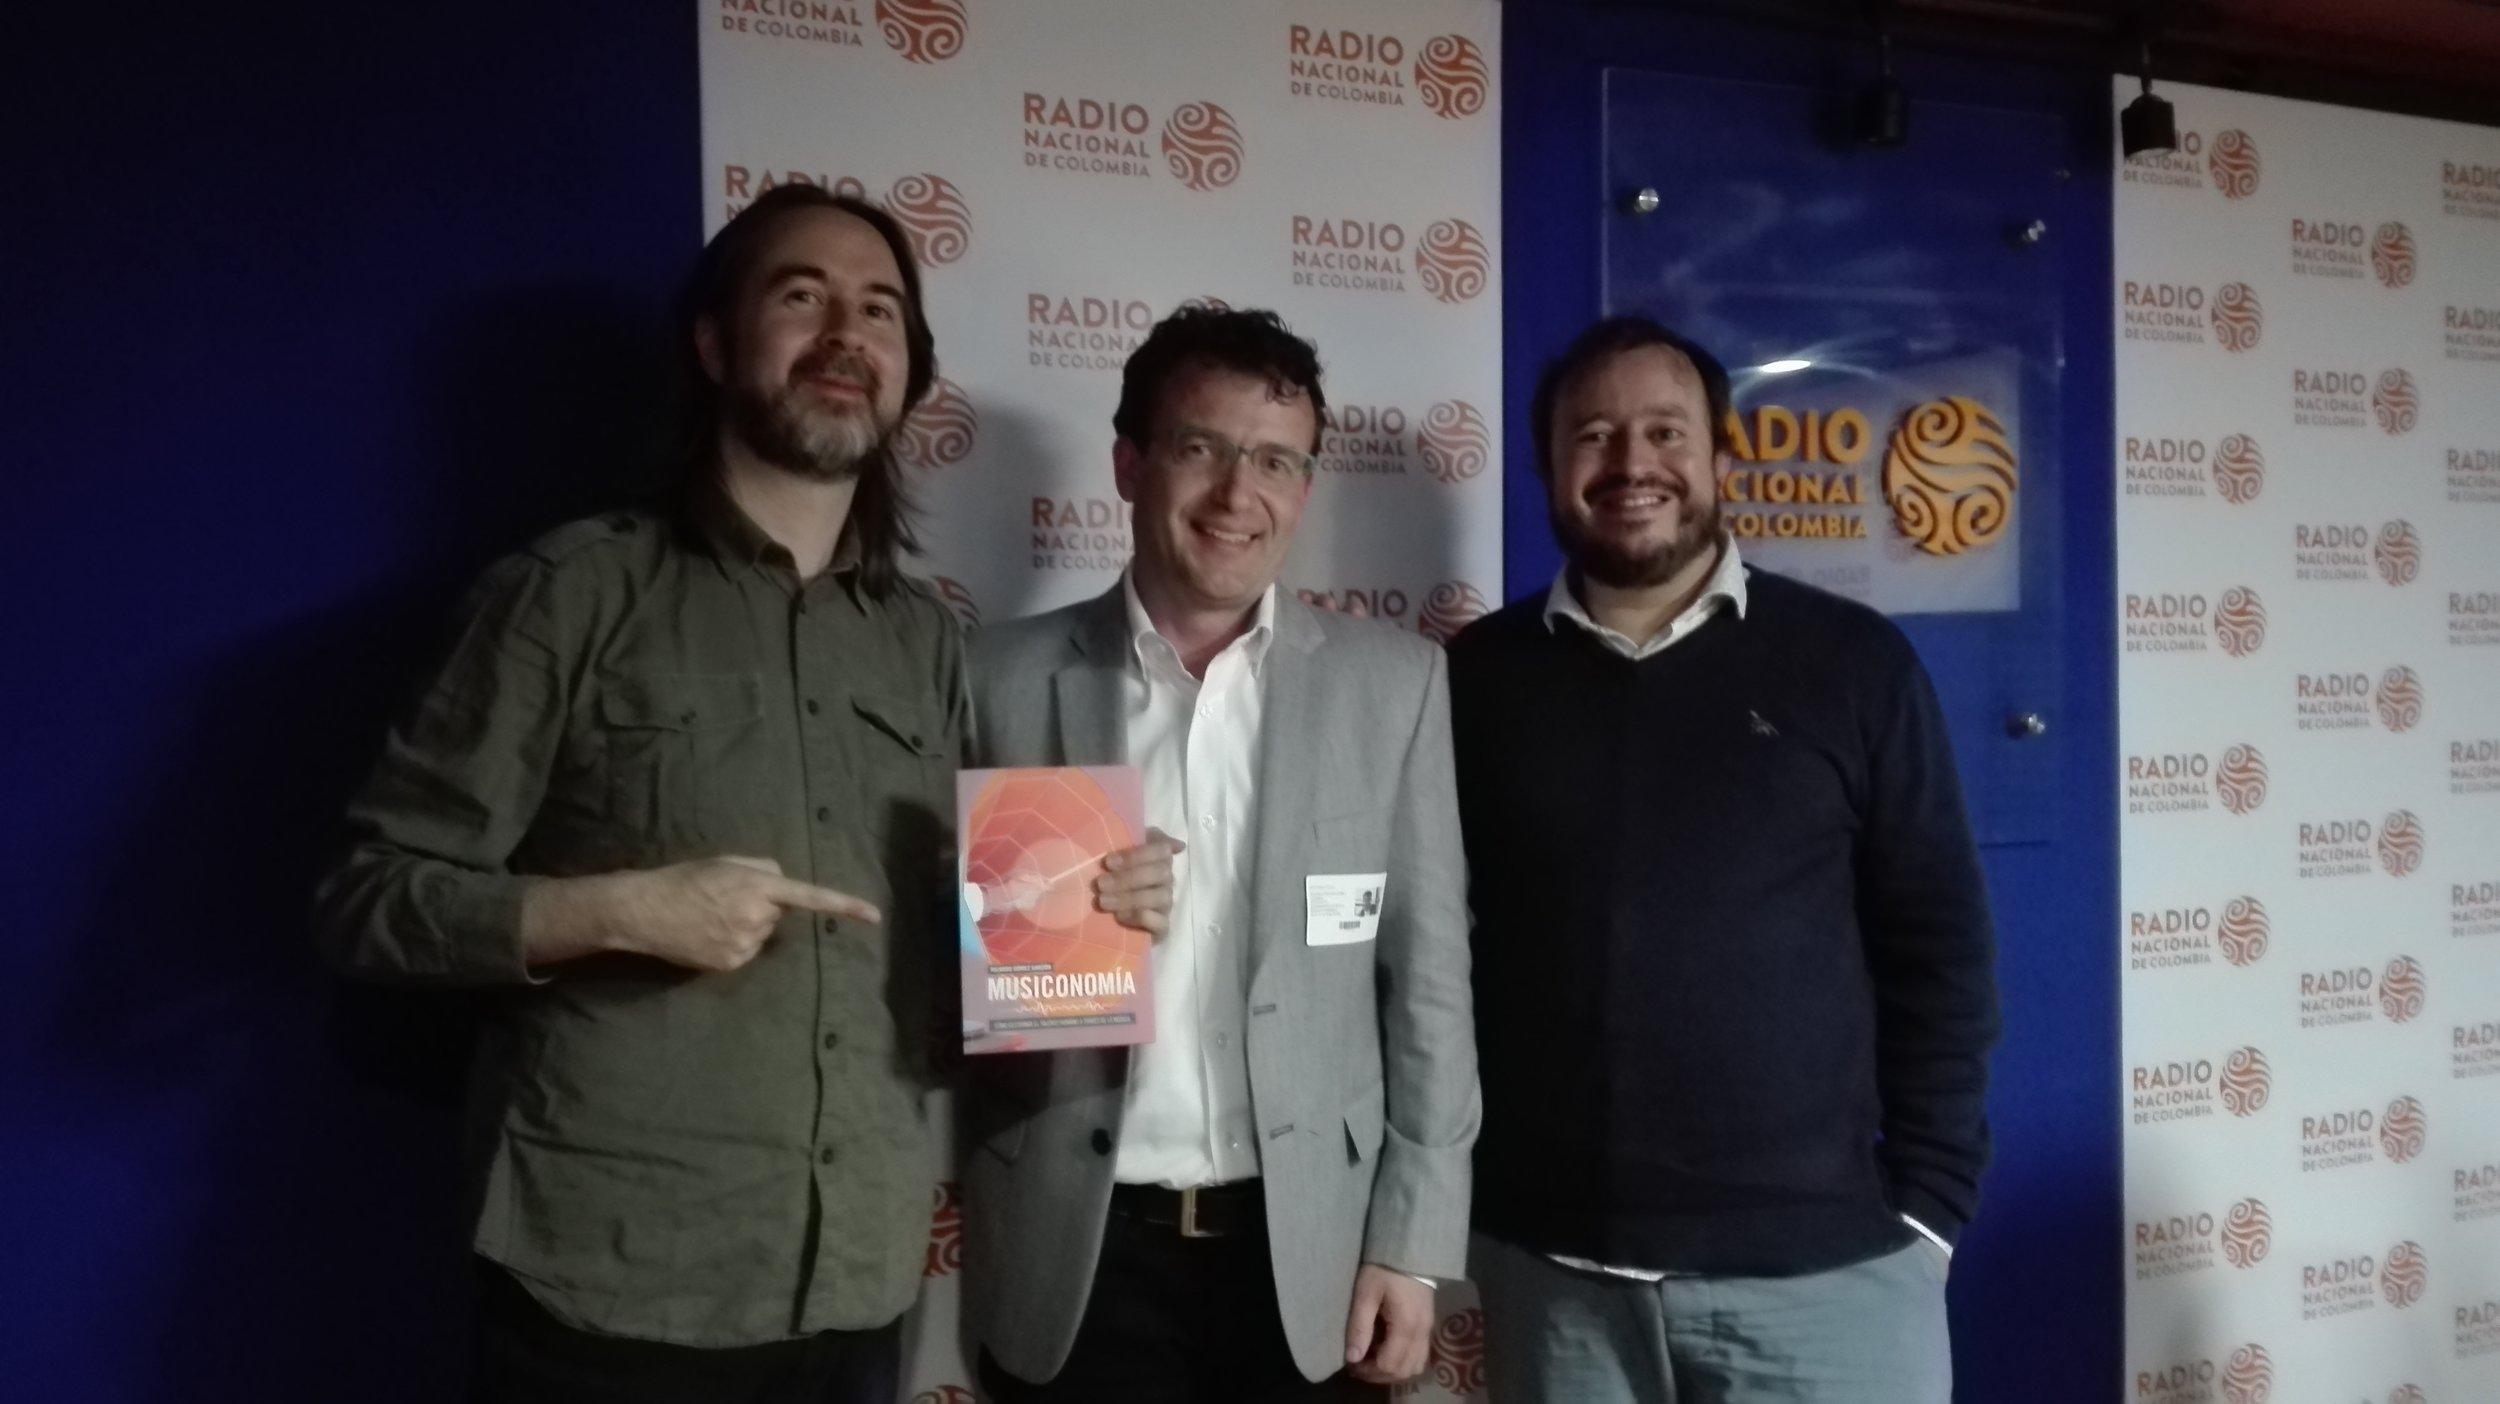 Juan Carlos Garay, Ricardo Gómez y Jaime Andrés Monsalve -